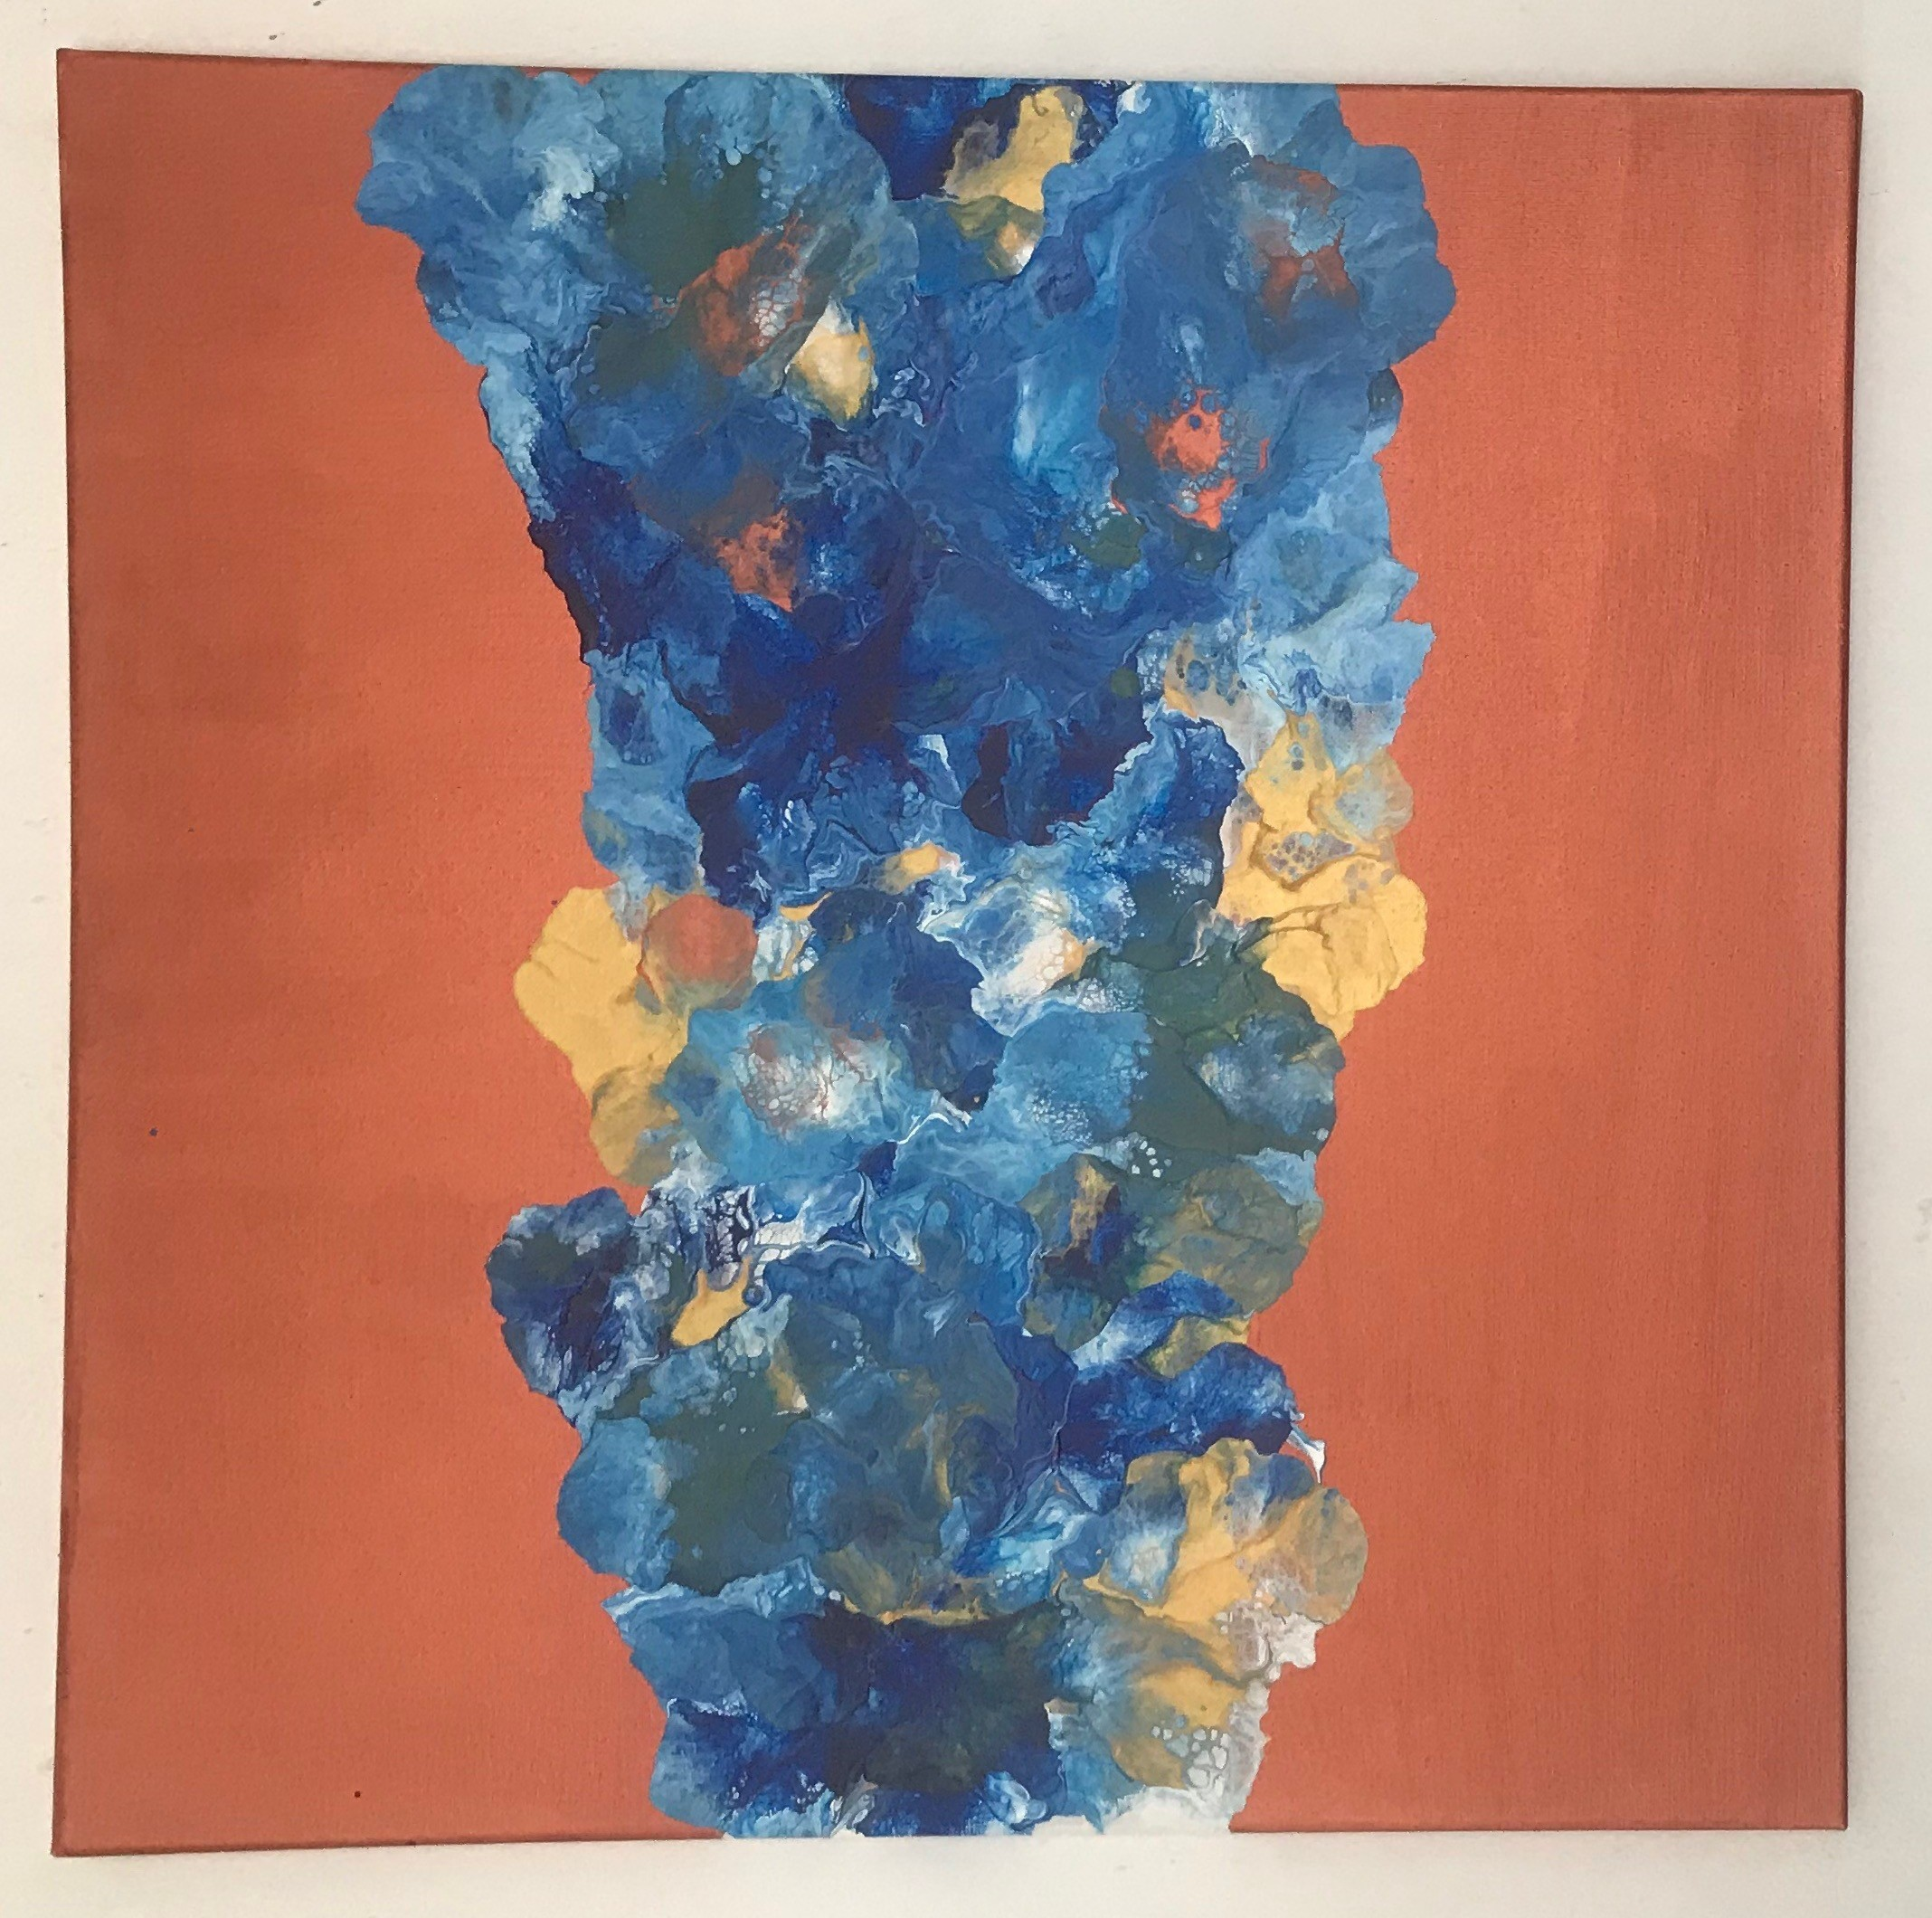 Ebb & flow of life II by Thilini De Simon